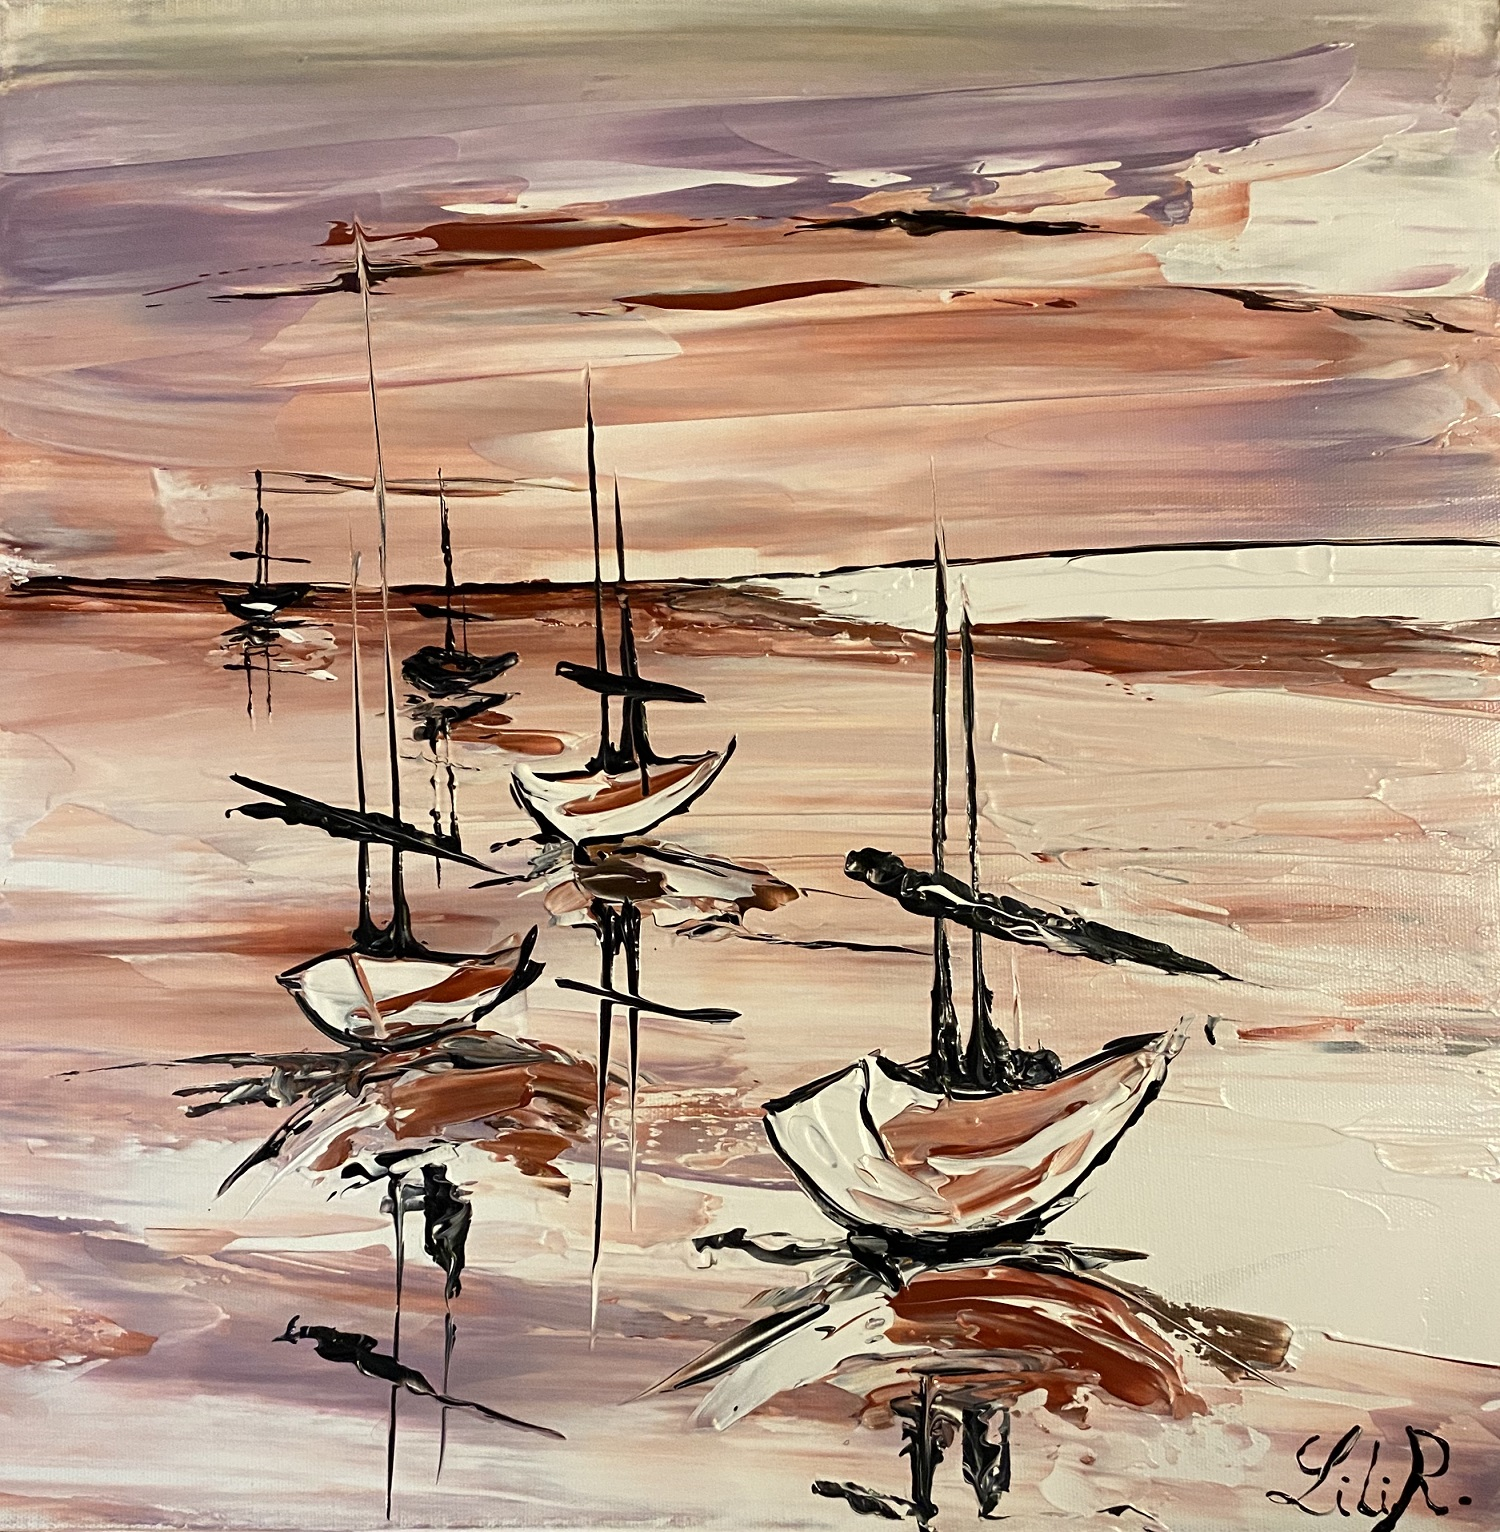 meilleur-peintre-tableau-marine-pleine-mer-de-la-cote-fleuri-severine-richer-collection-liliR-normandie.jpg